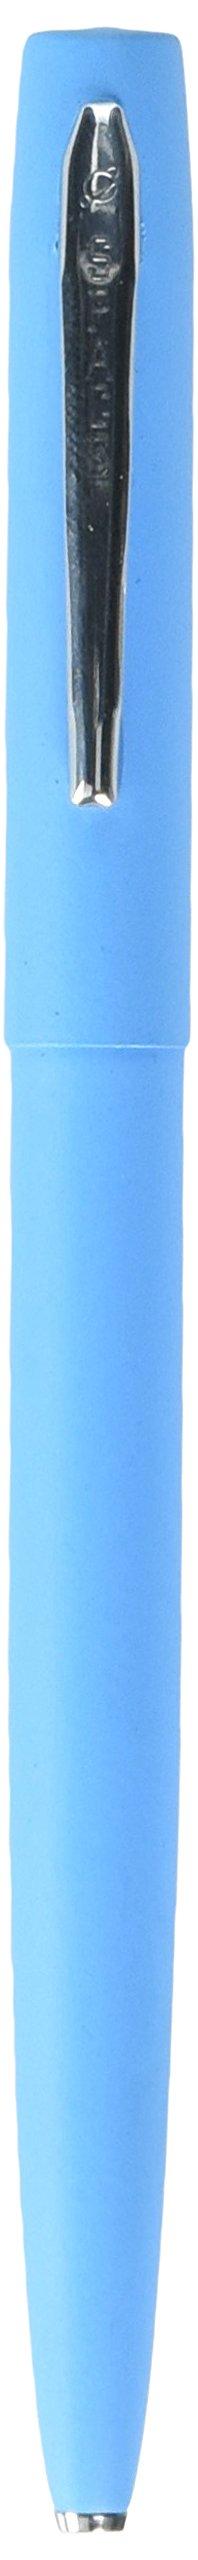 Fisher Space Pen M4 Series, Blue Cap and Barrel, Chrome Clip